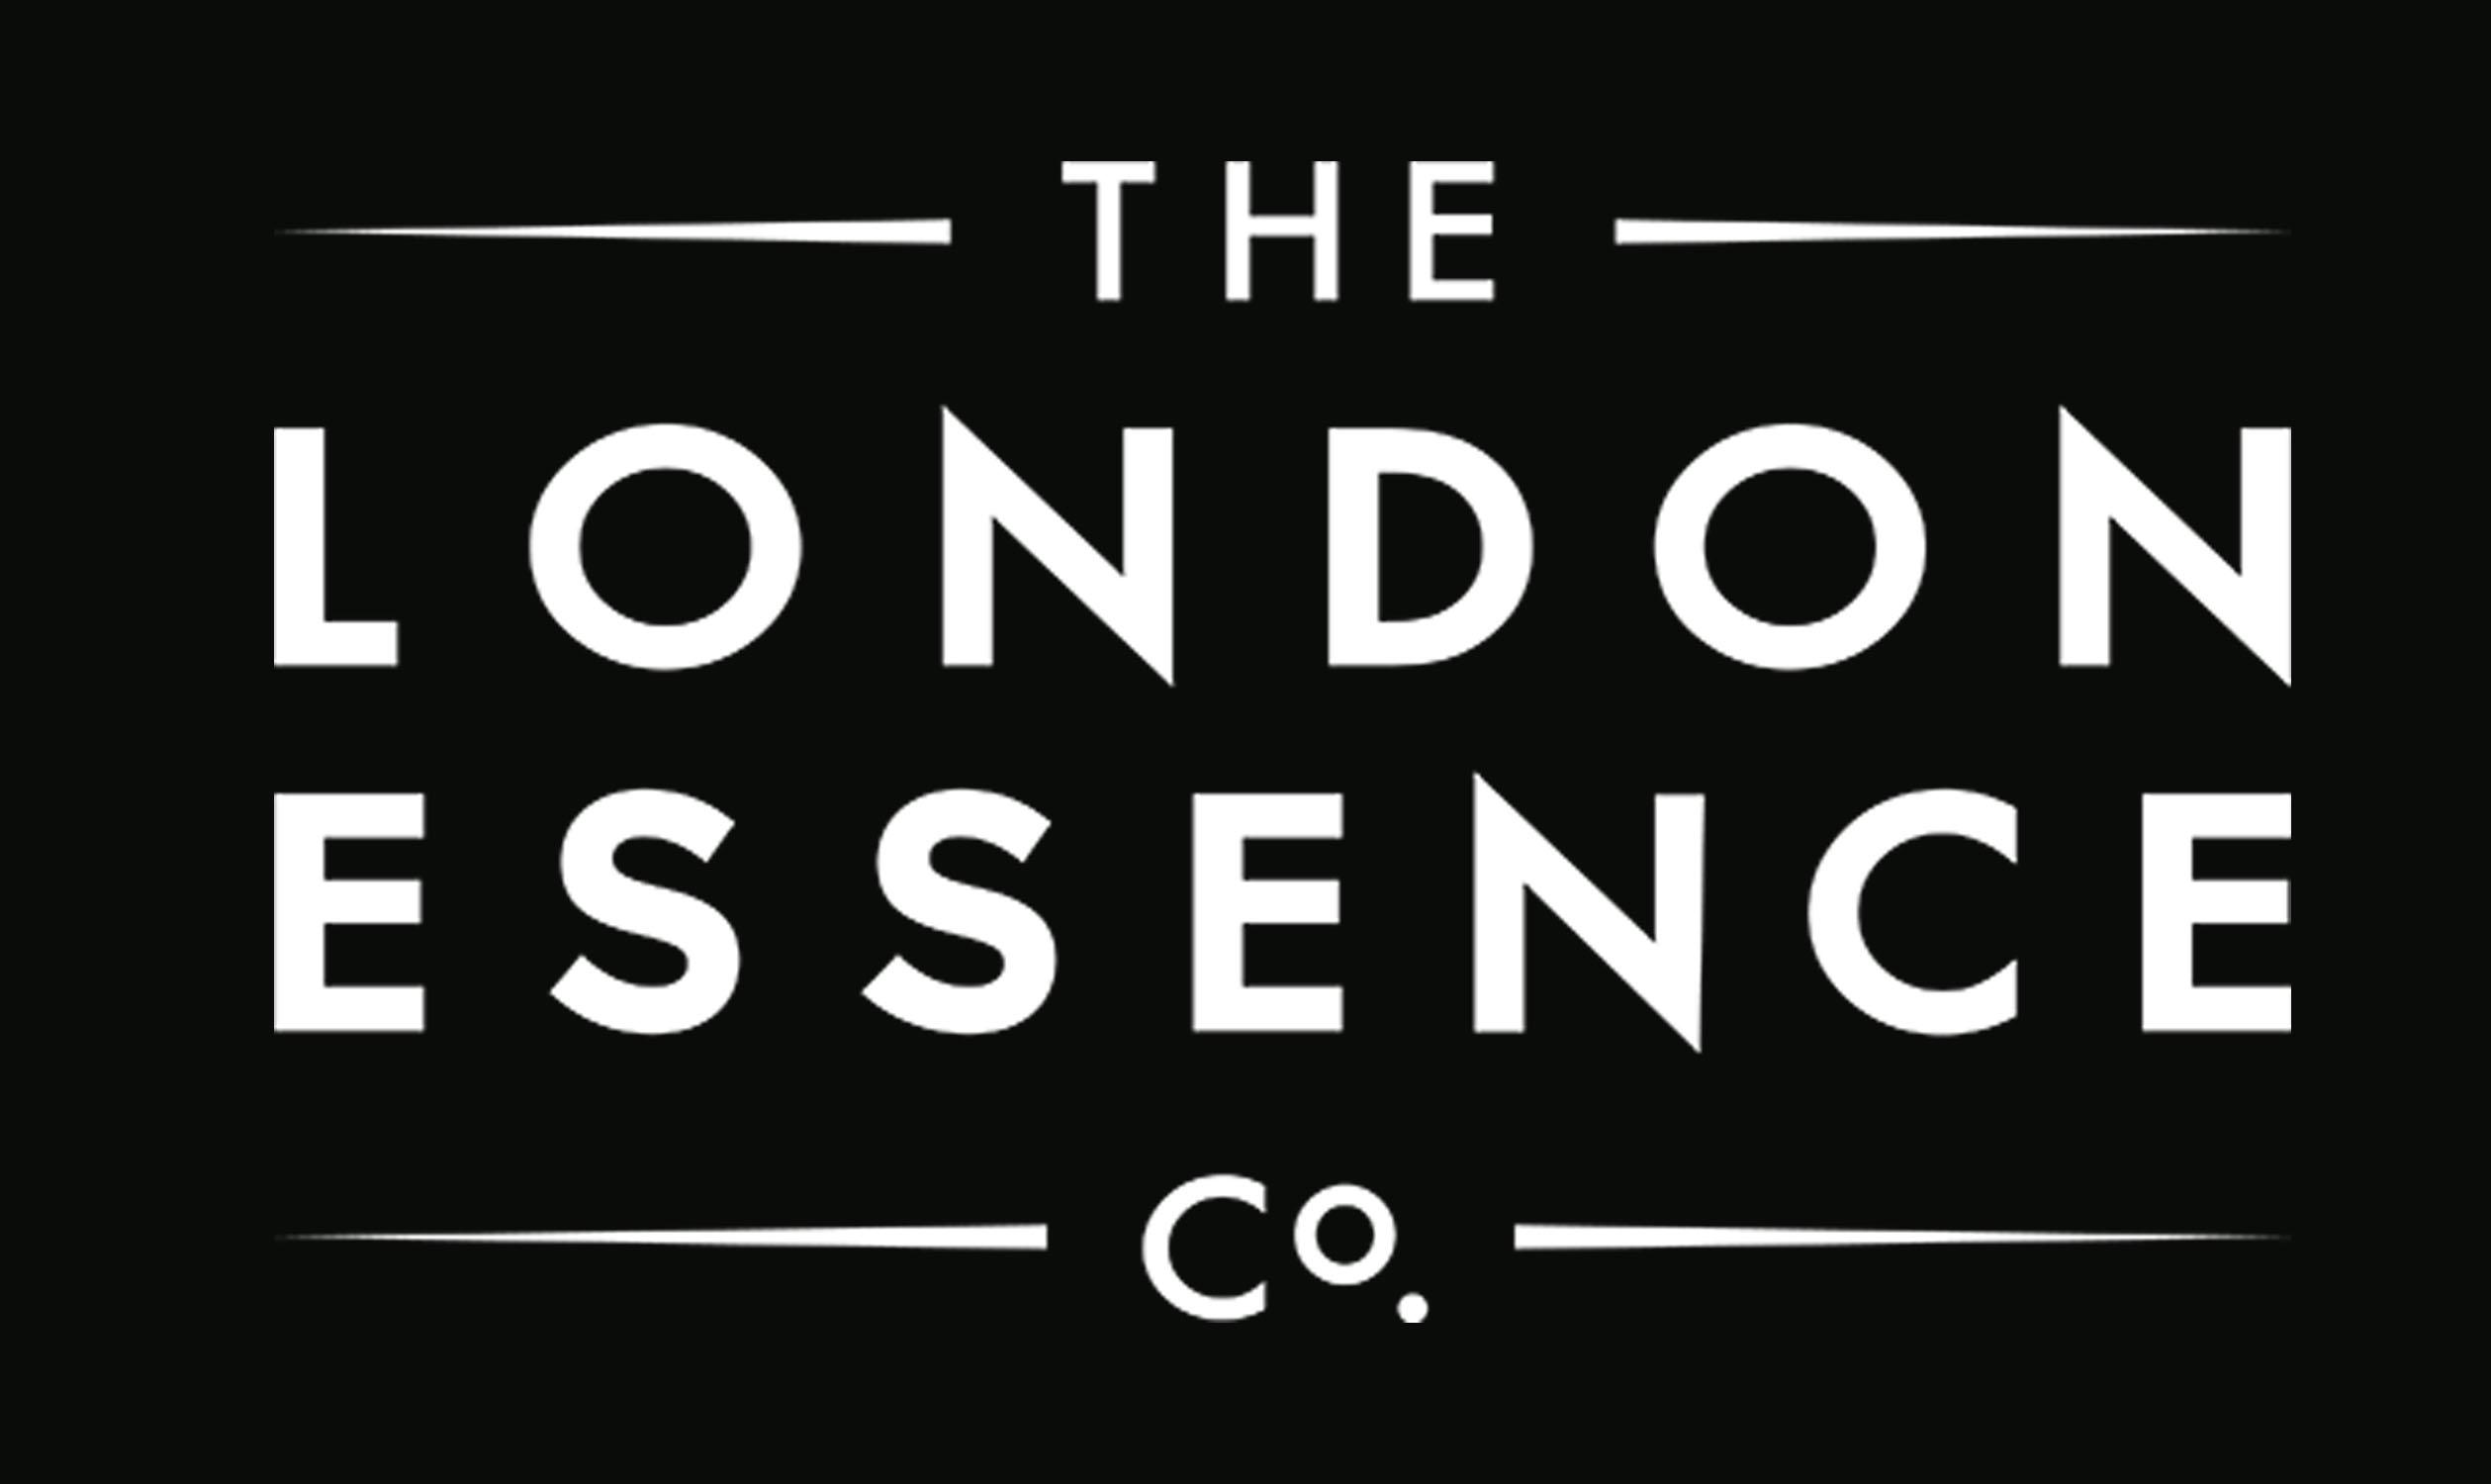 London Essence Co.